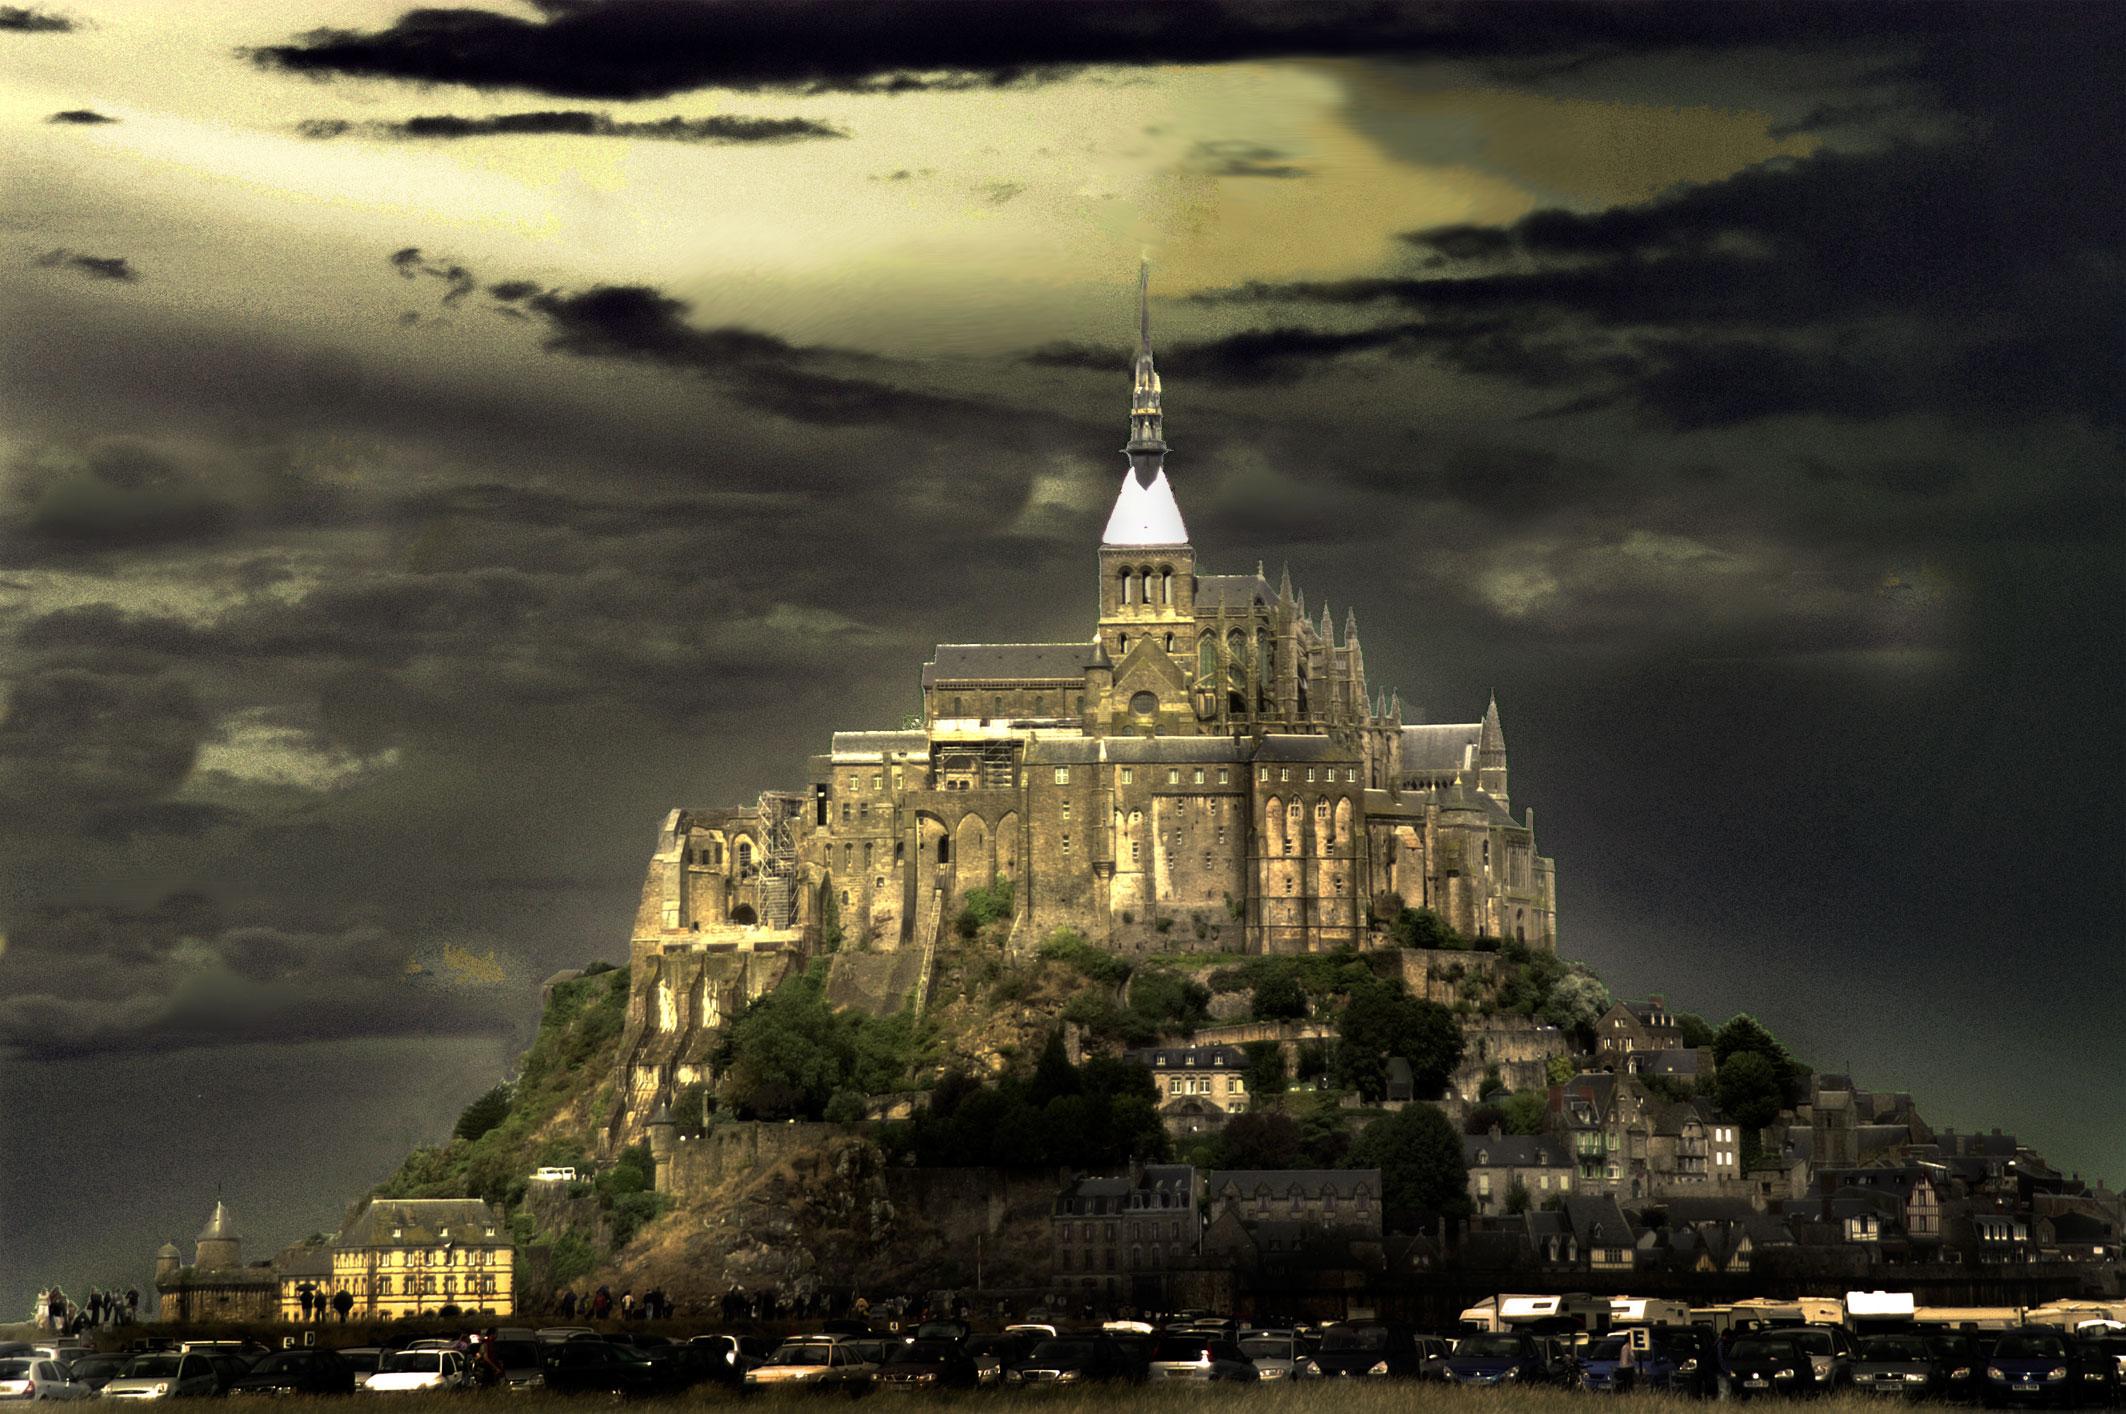 Mont Saint-Michel at night.